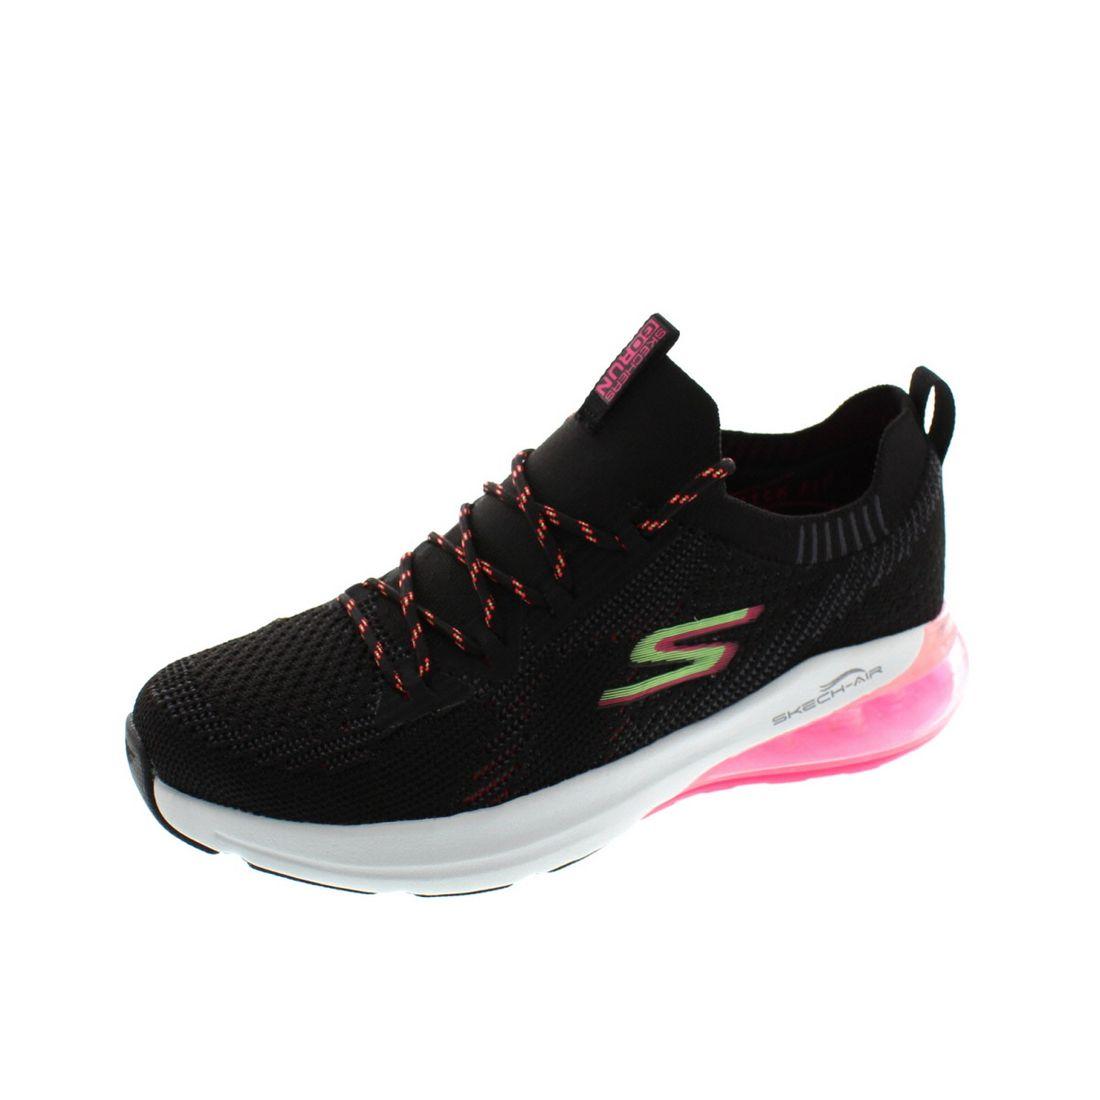 Skechers Damenschuhe - GO Run Air Stratus 16071 - black multi